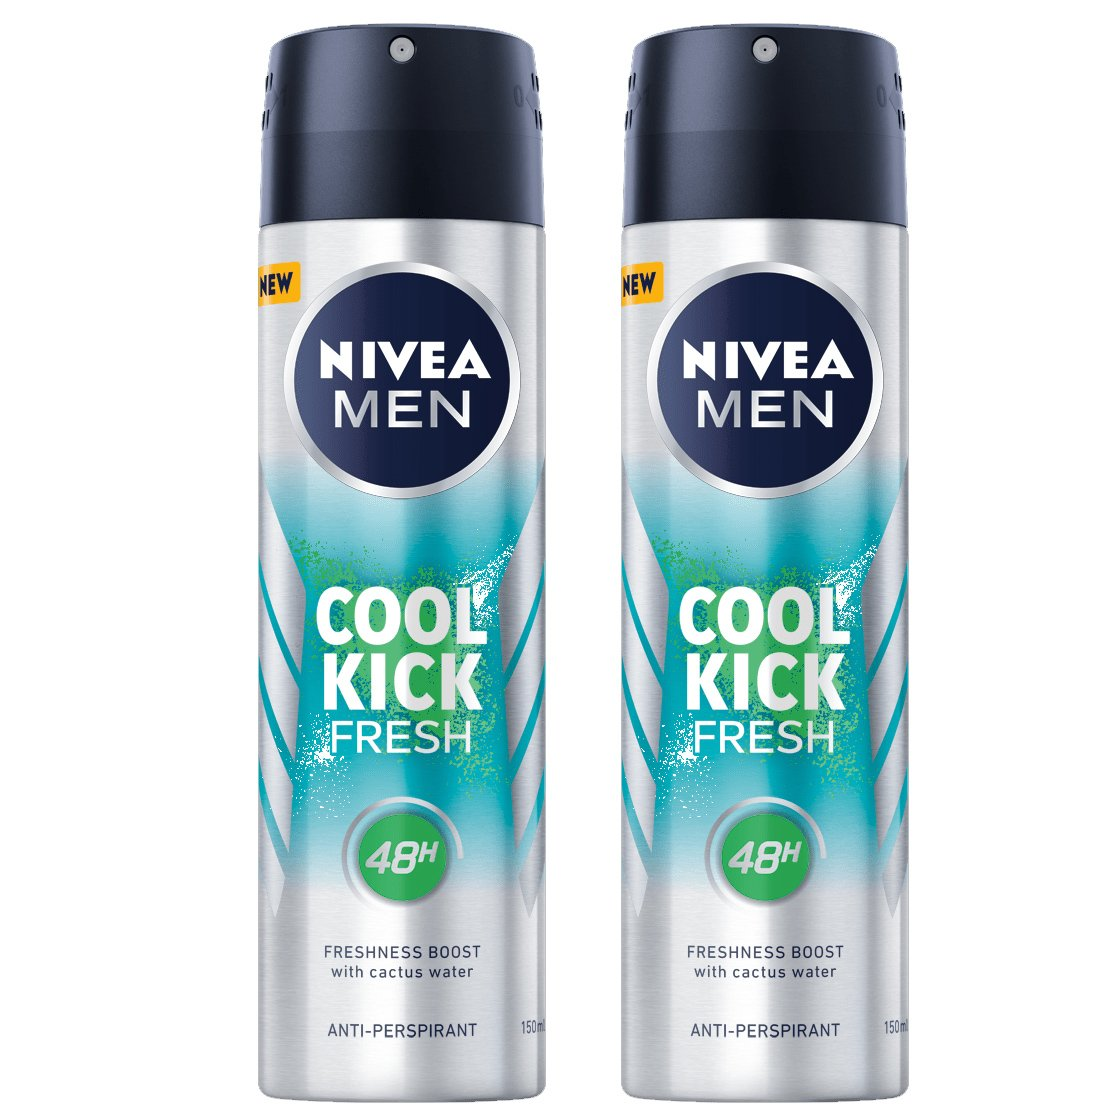 Nivea Men Πακέτο Προσφοράς Cool Kick Fresh Skin Active Deo Spray Αποσμητικό 48ωρης Προστασίας με Νερό Κάκτου 2x150ml 1+1 Δώρο